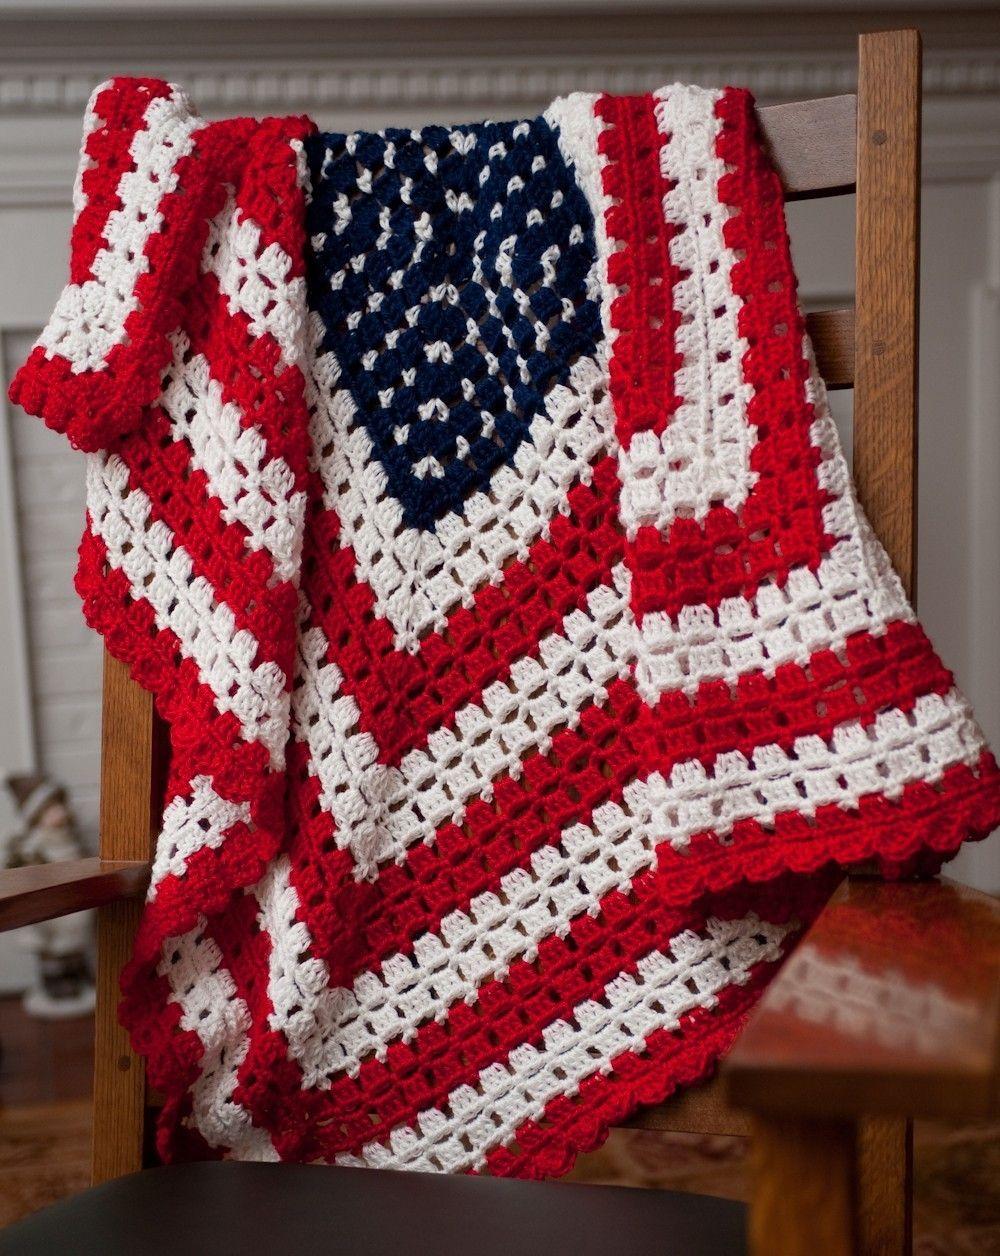 New+Free+Crochet+Patterns | CROCHET PATTERNS FOR THROWS | Crochet ...